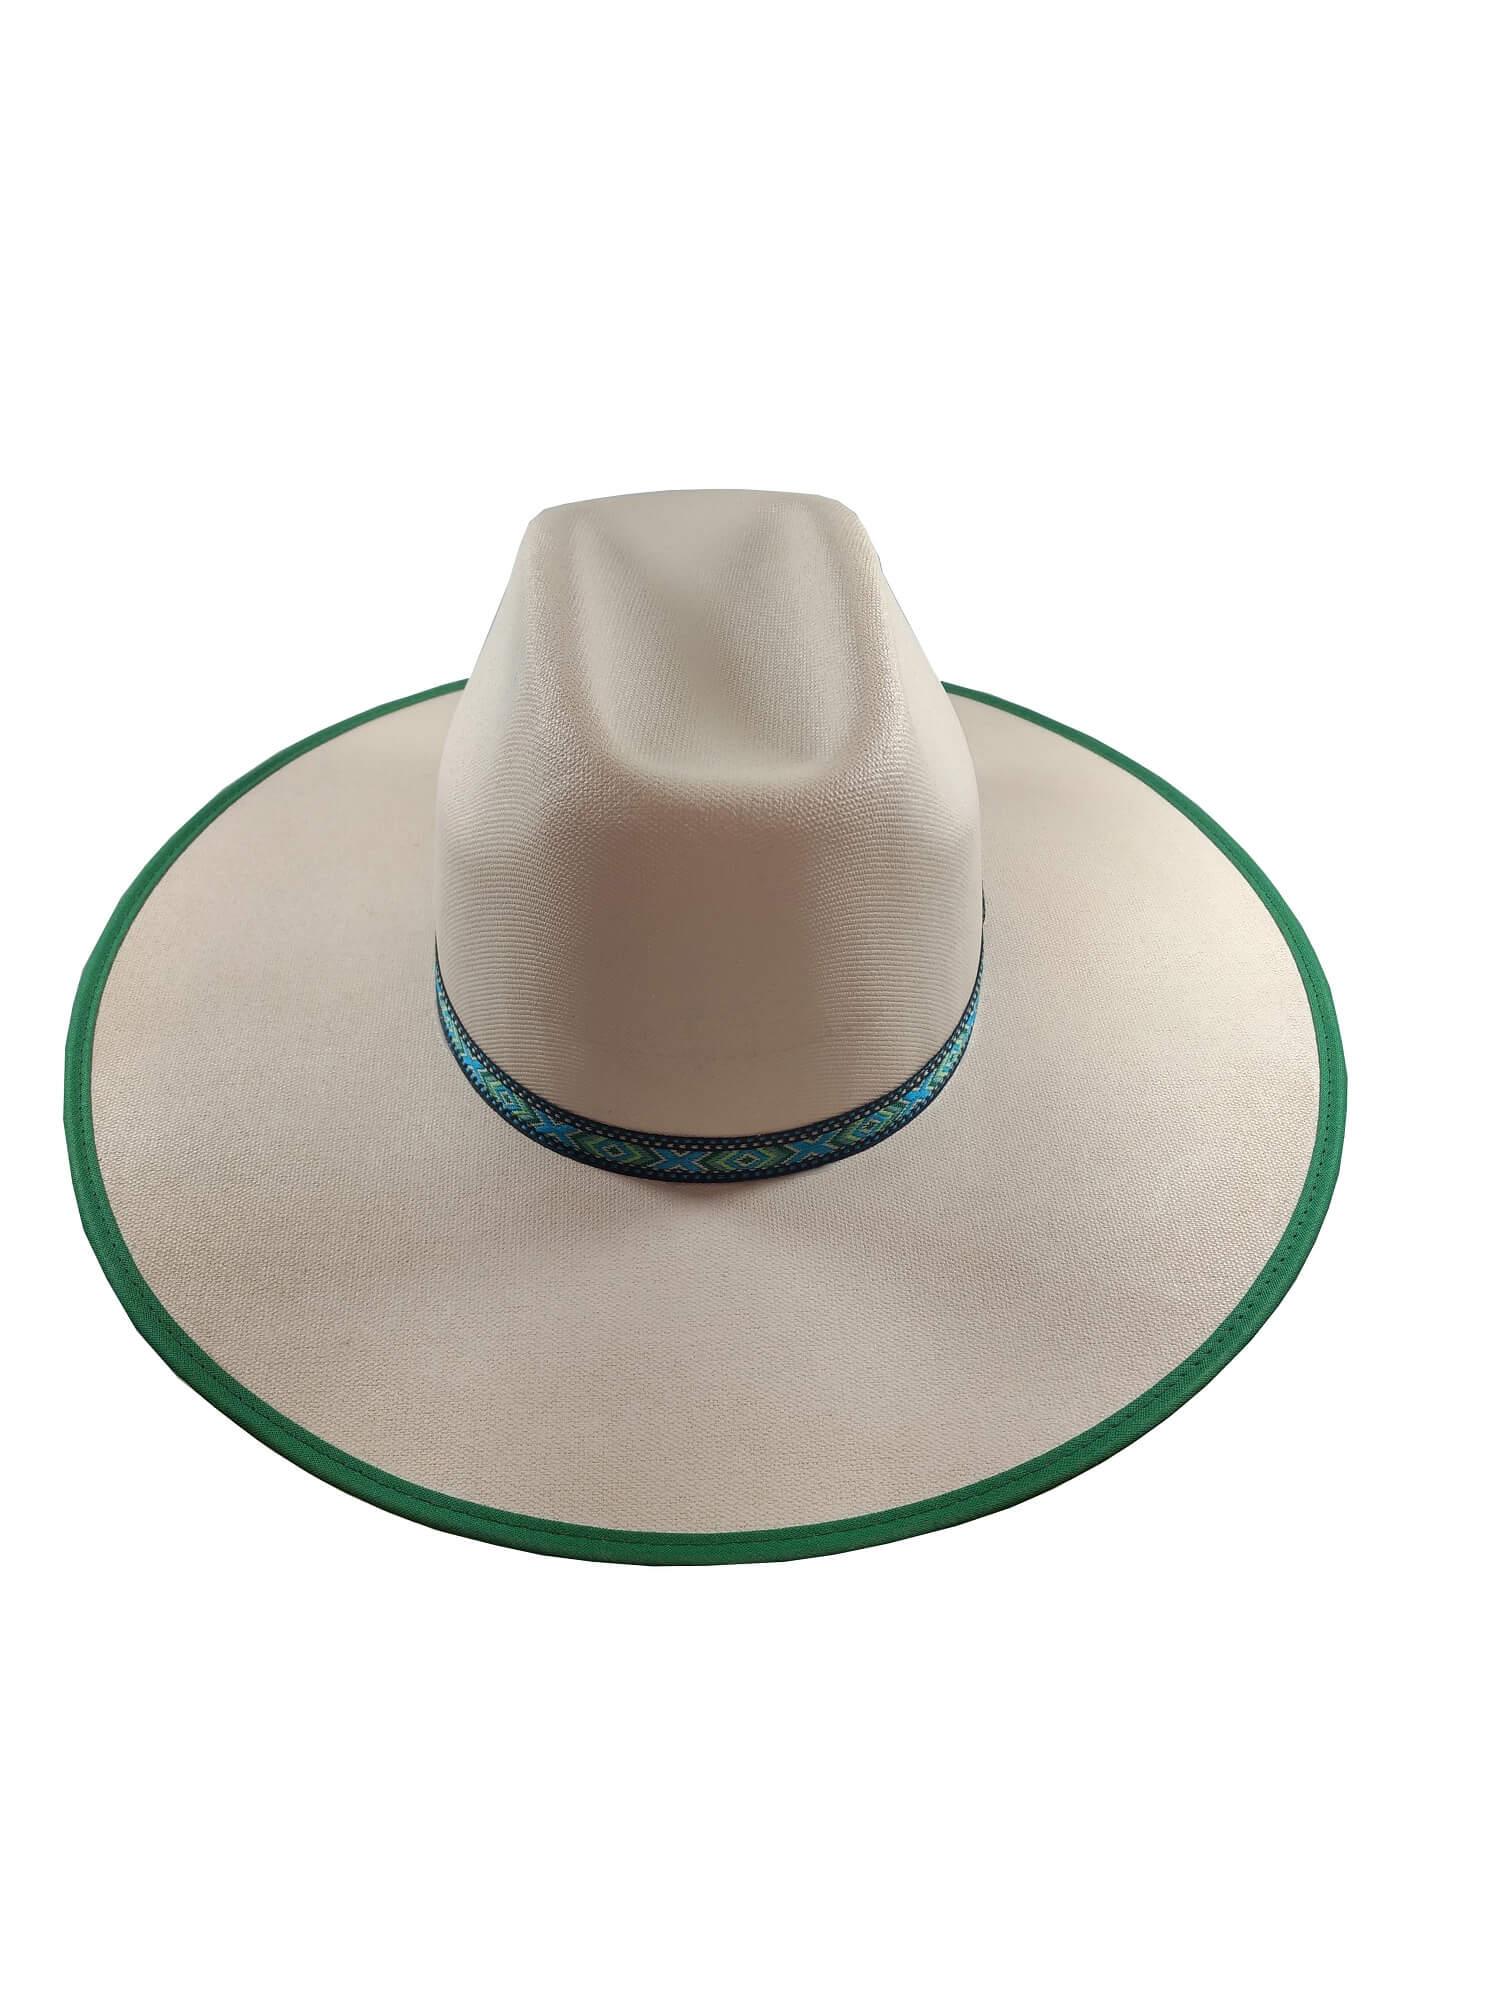 Chapéu Dallas Branco com Viés Verde  Ref. 6777